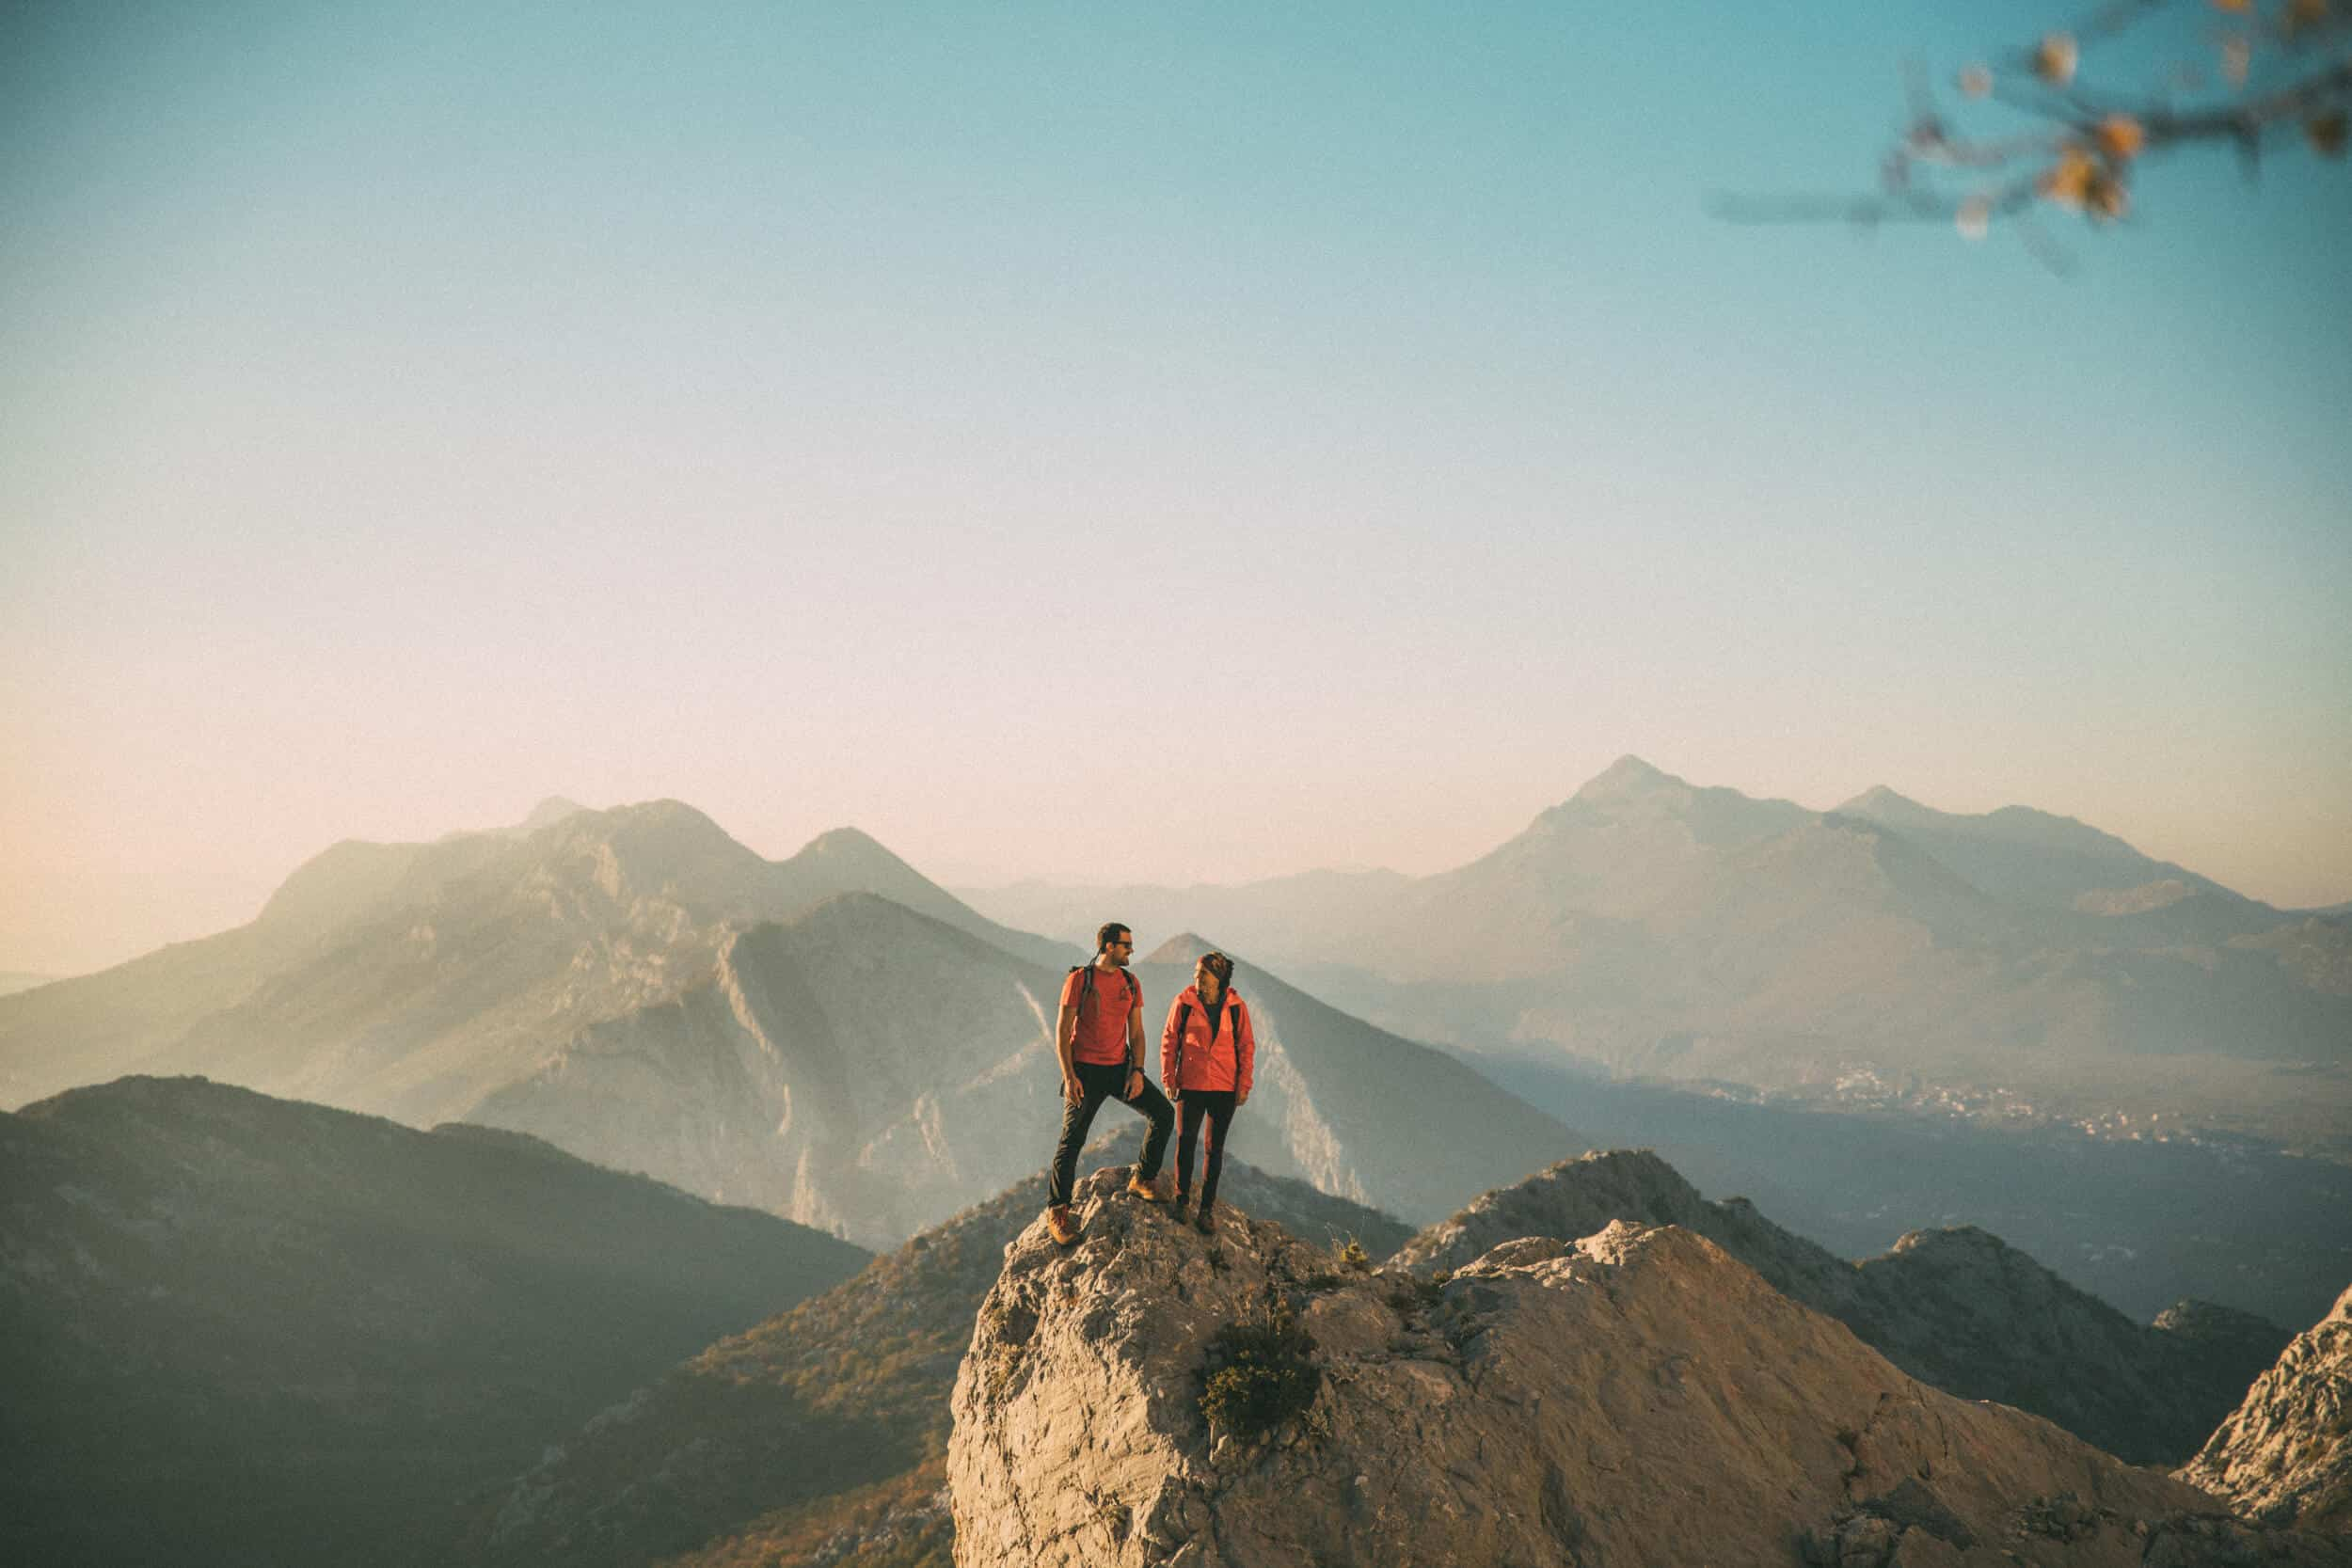 Croatia honeymoon ideas 022 | Croatia Elopement Photographer and Videographer